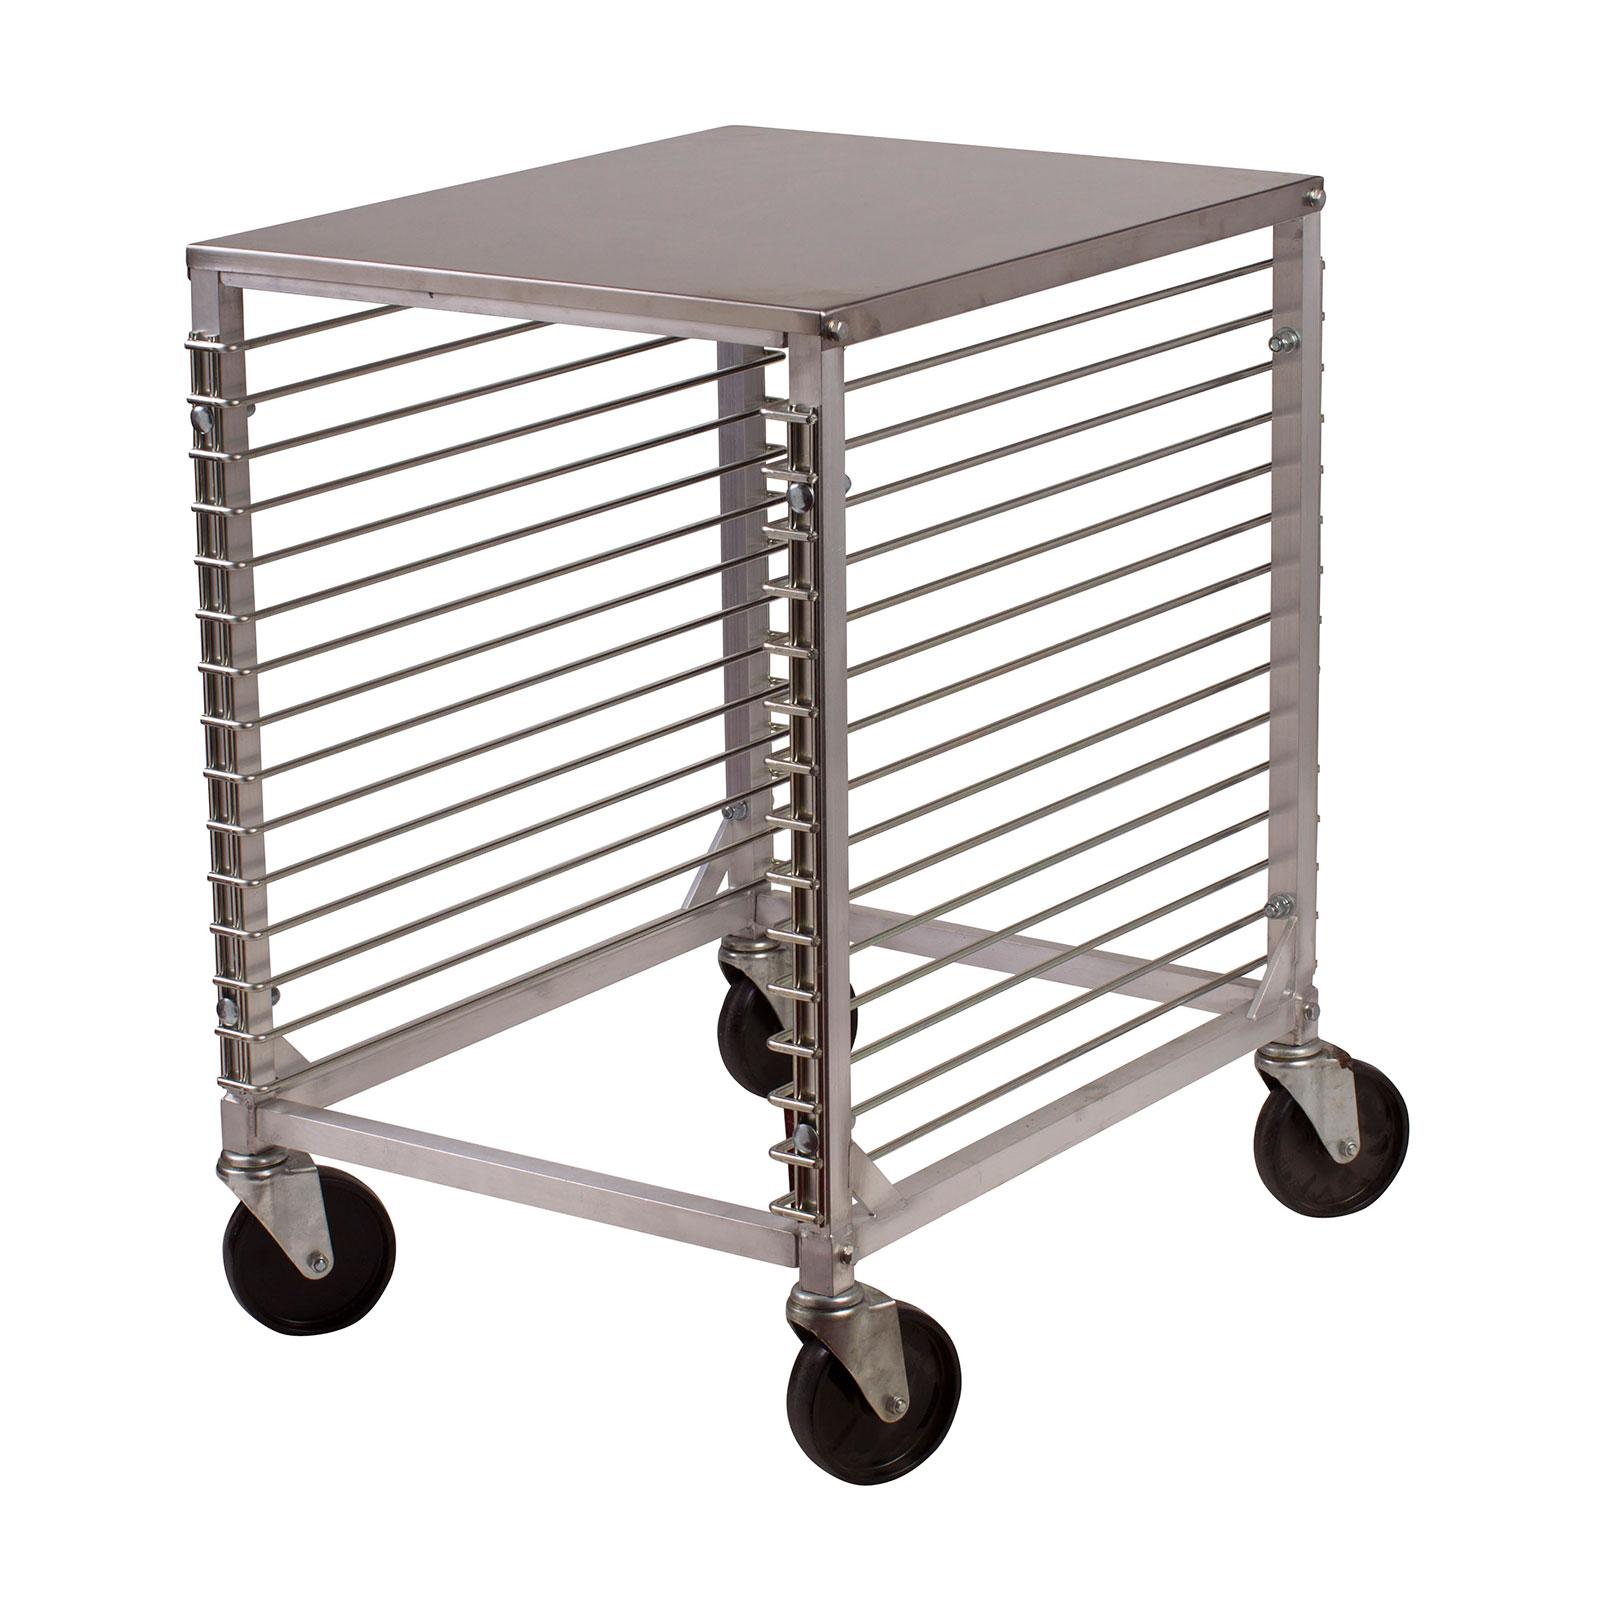 Winco ALRK-15 pan rack, universal